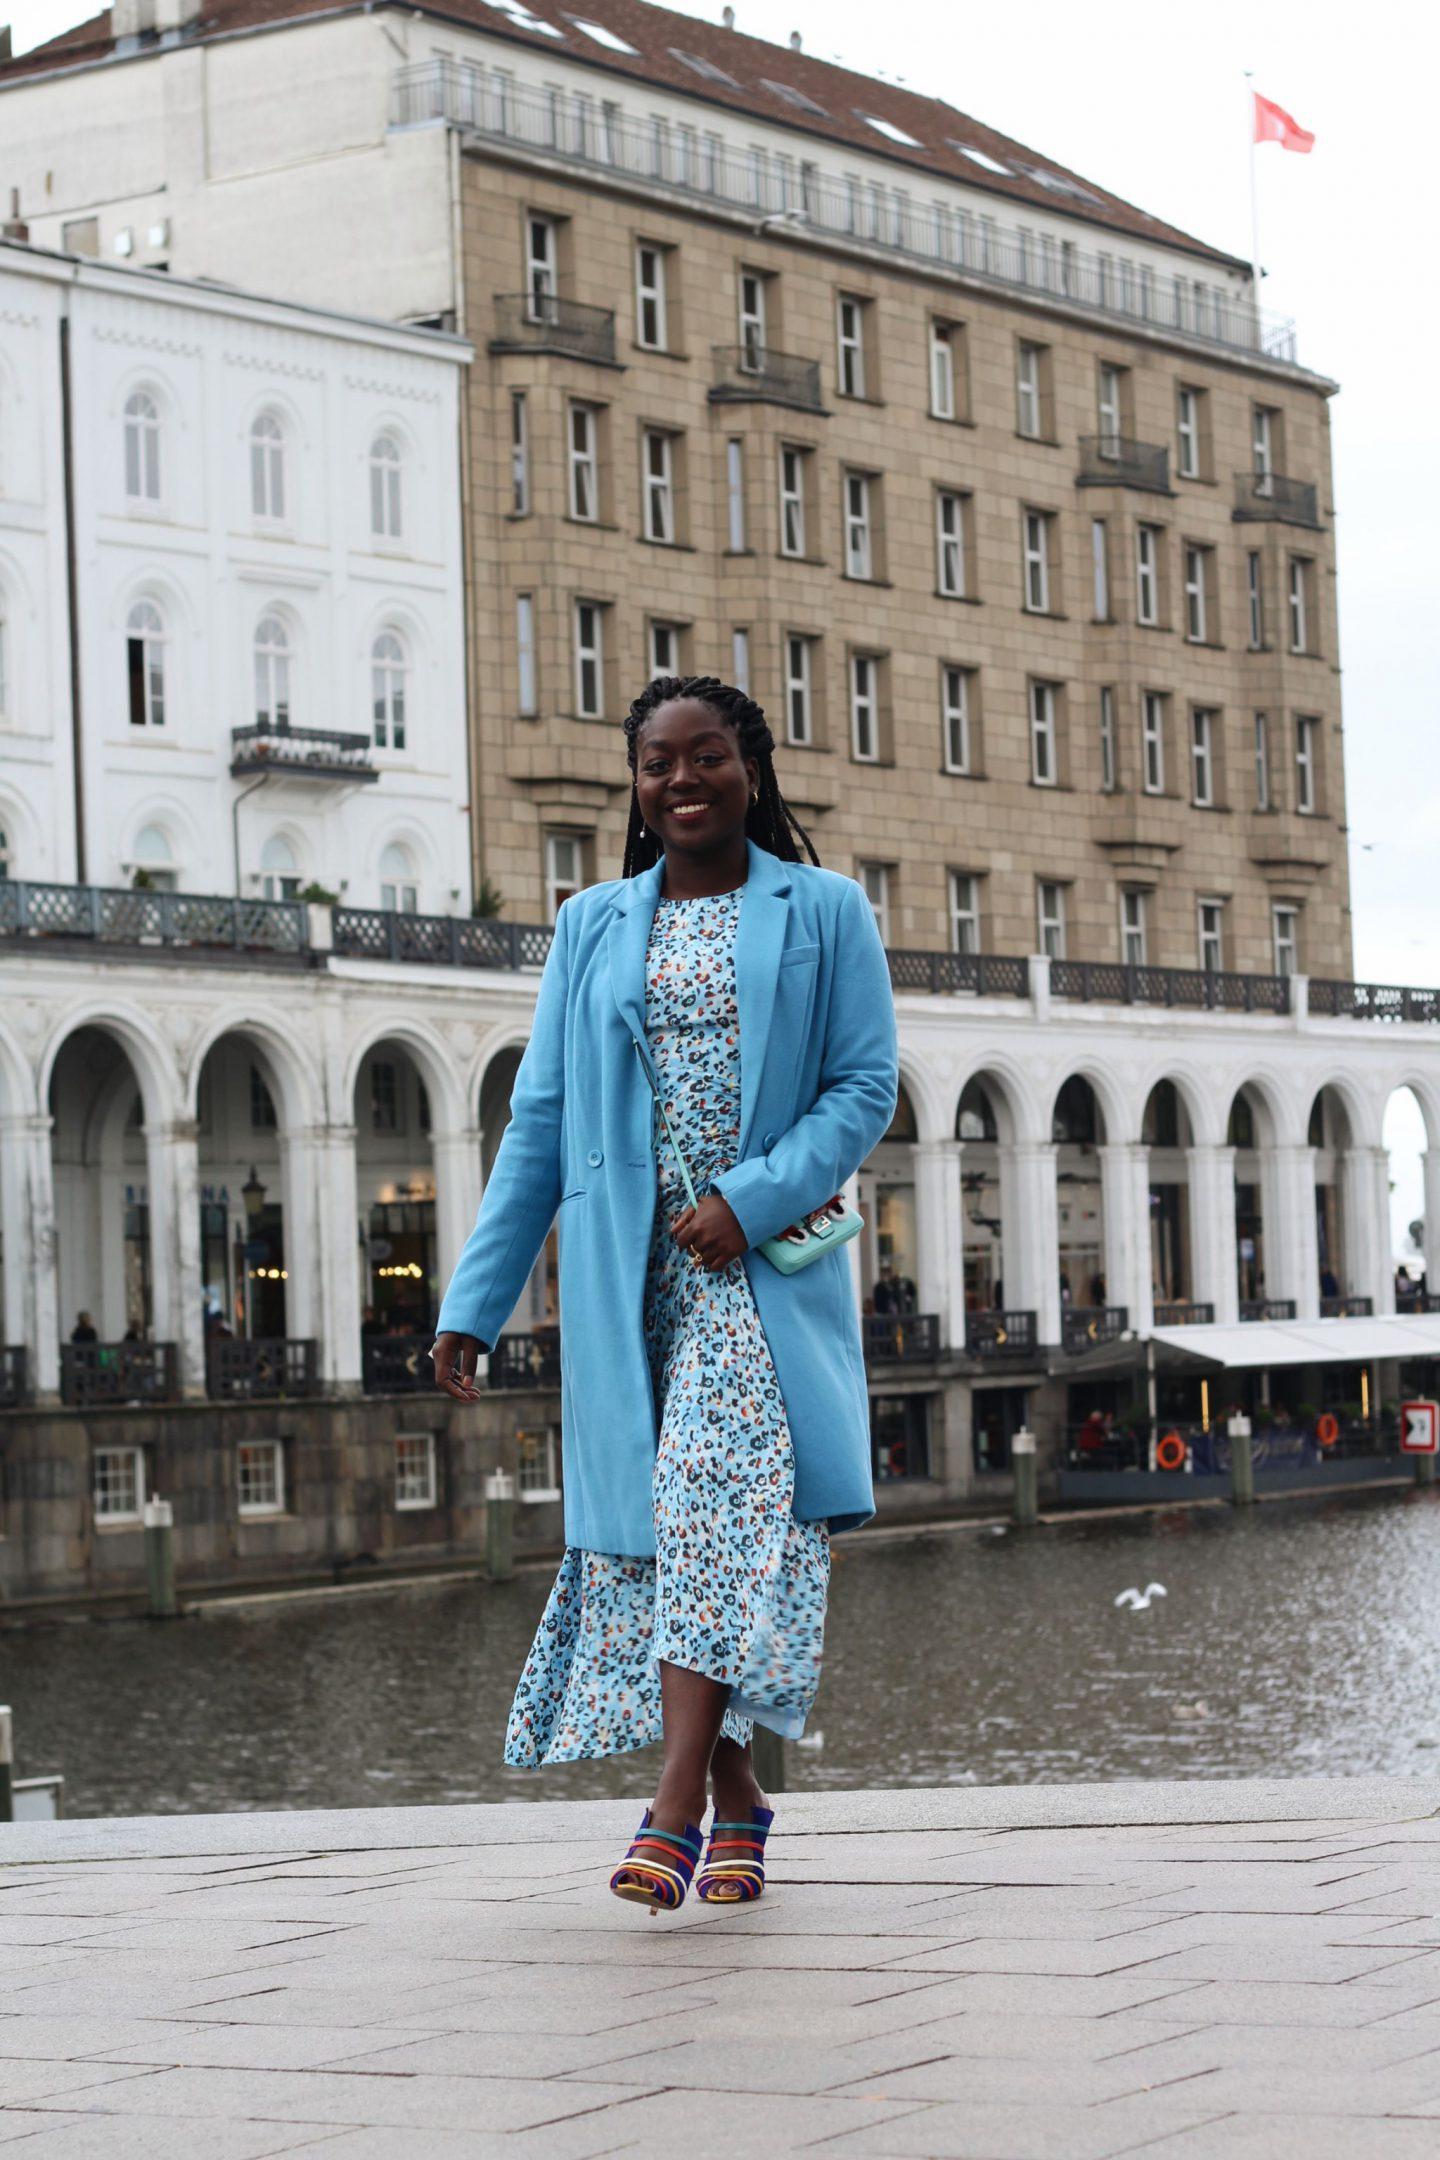 Lala_Berlin_Streetstyle_Lois_Opoku_Fashion_Blogger_Fendi_Monster_Malone_Souliers_lisforlois_11